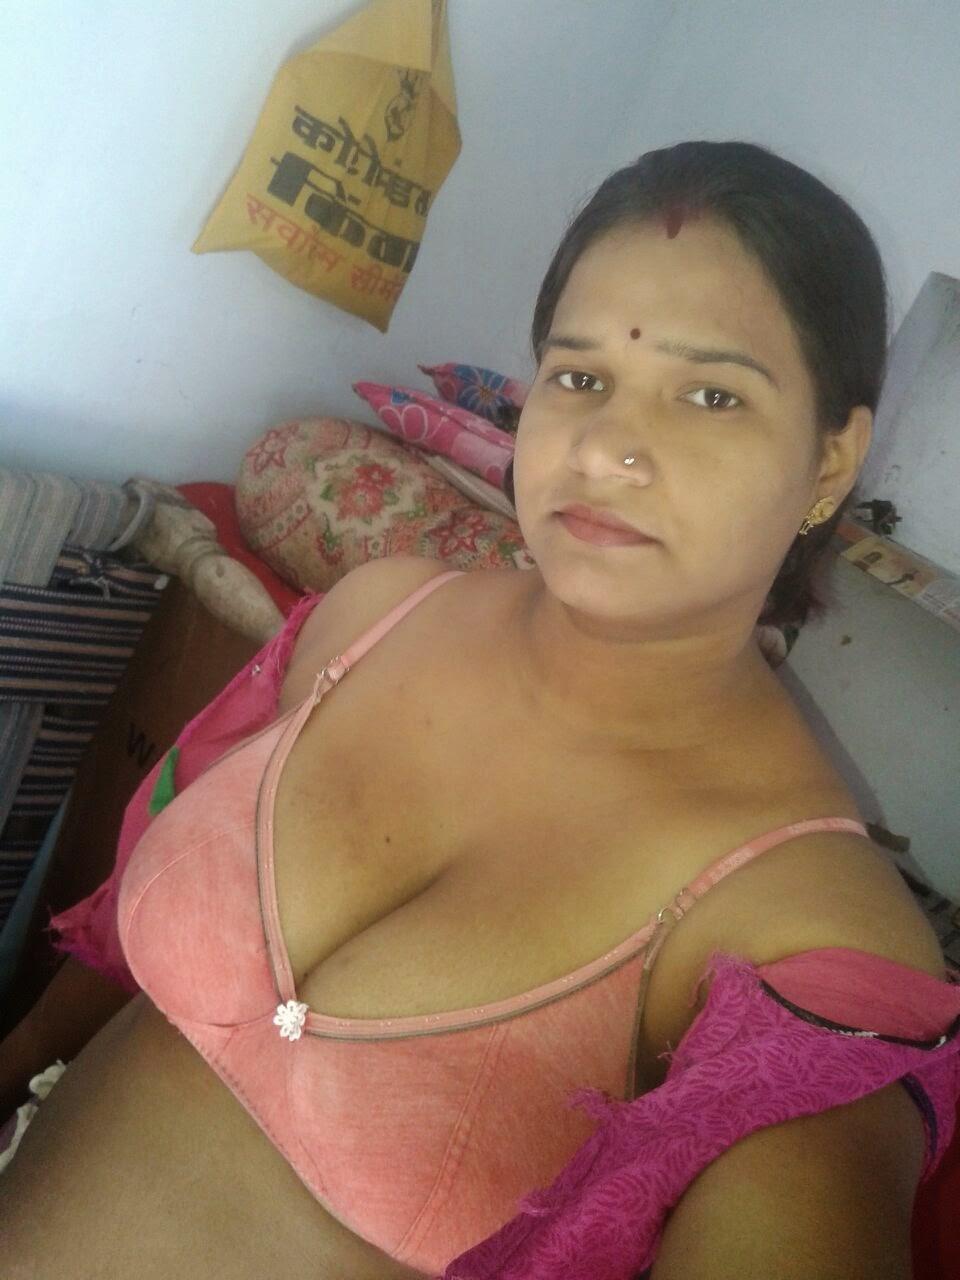 Desi only  Porn Video Playlist from Unknown  Pornhubcom